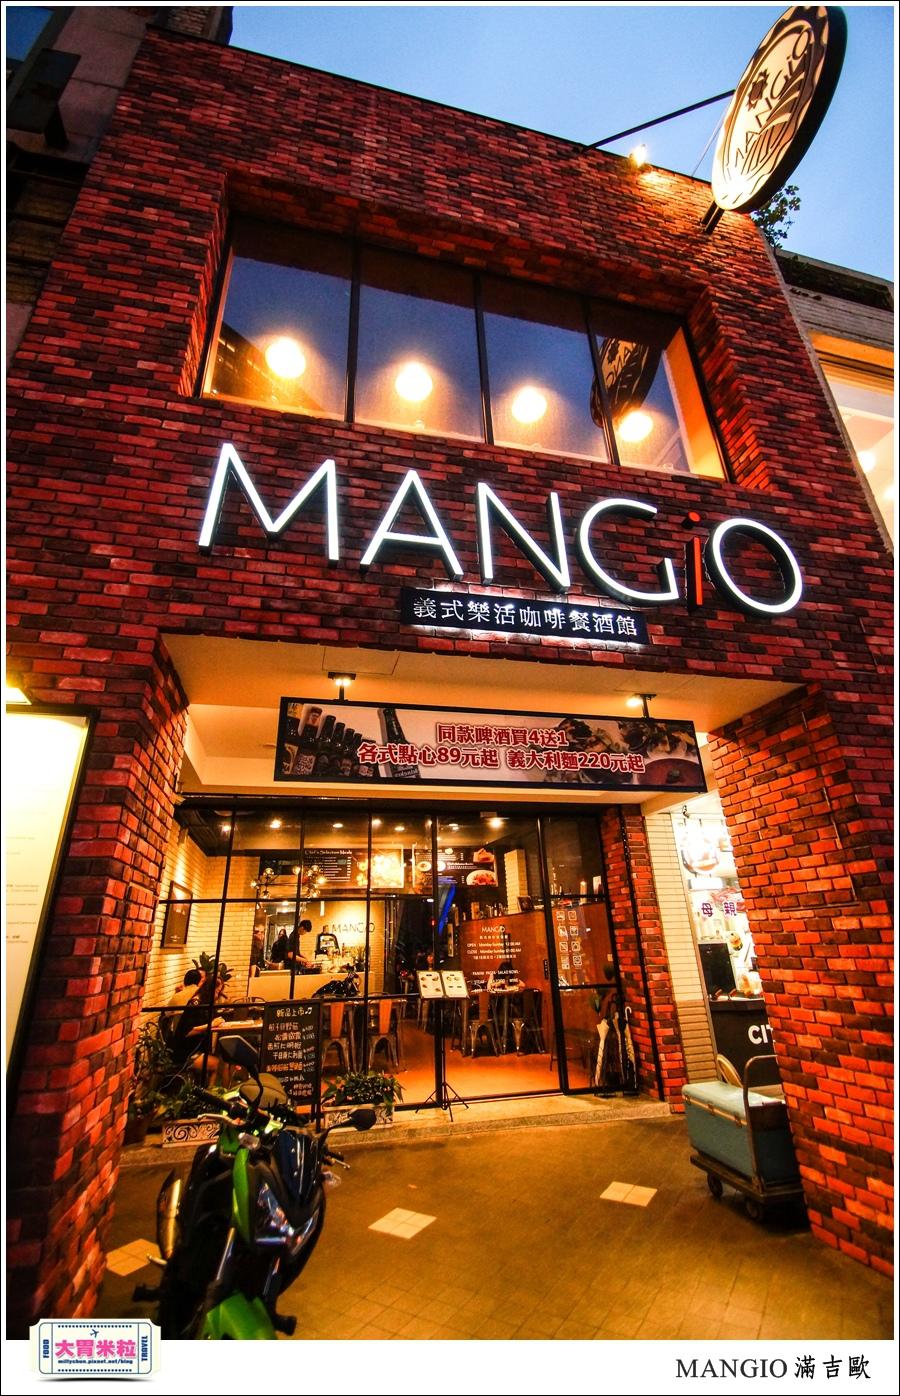 MANGiO Bistro 滿吉歐義式樂活餐酒館@台北餐酒館推薦@大胃米粒0001.jpg